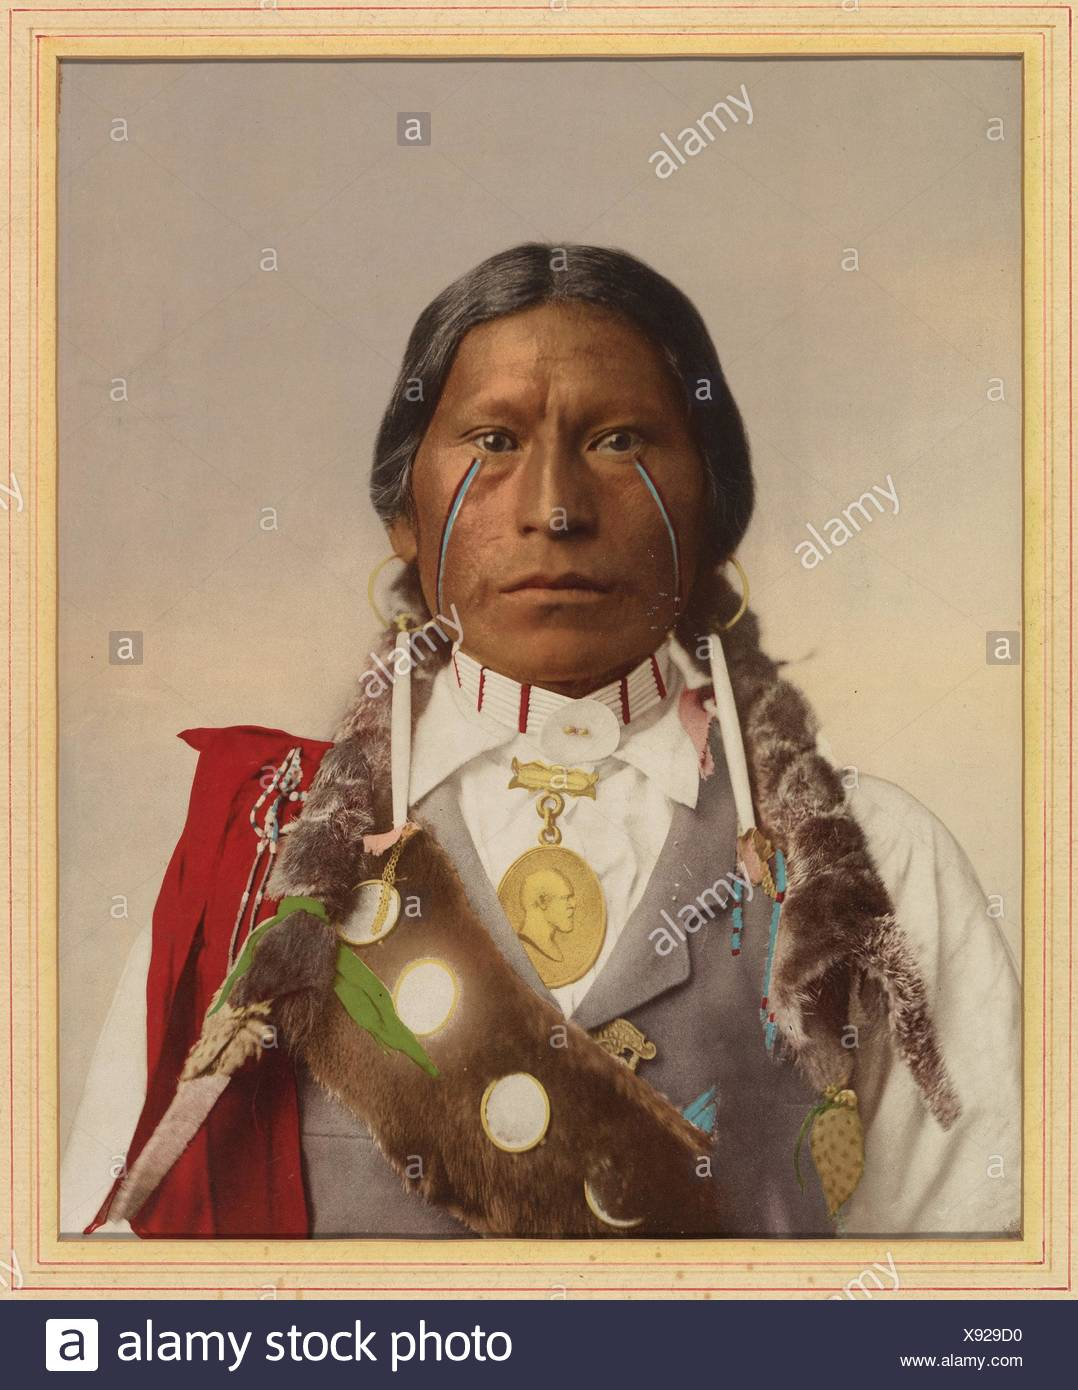 Native American dating verkossa